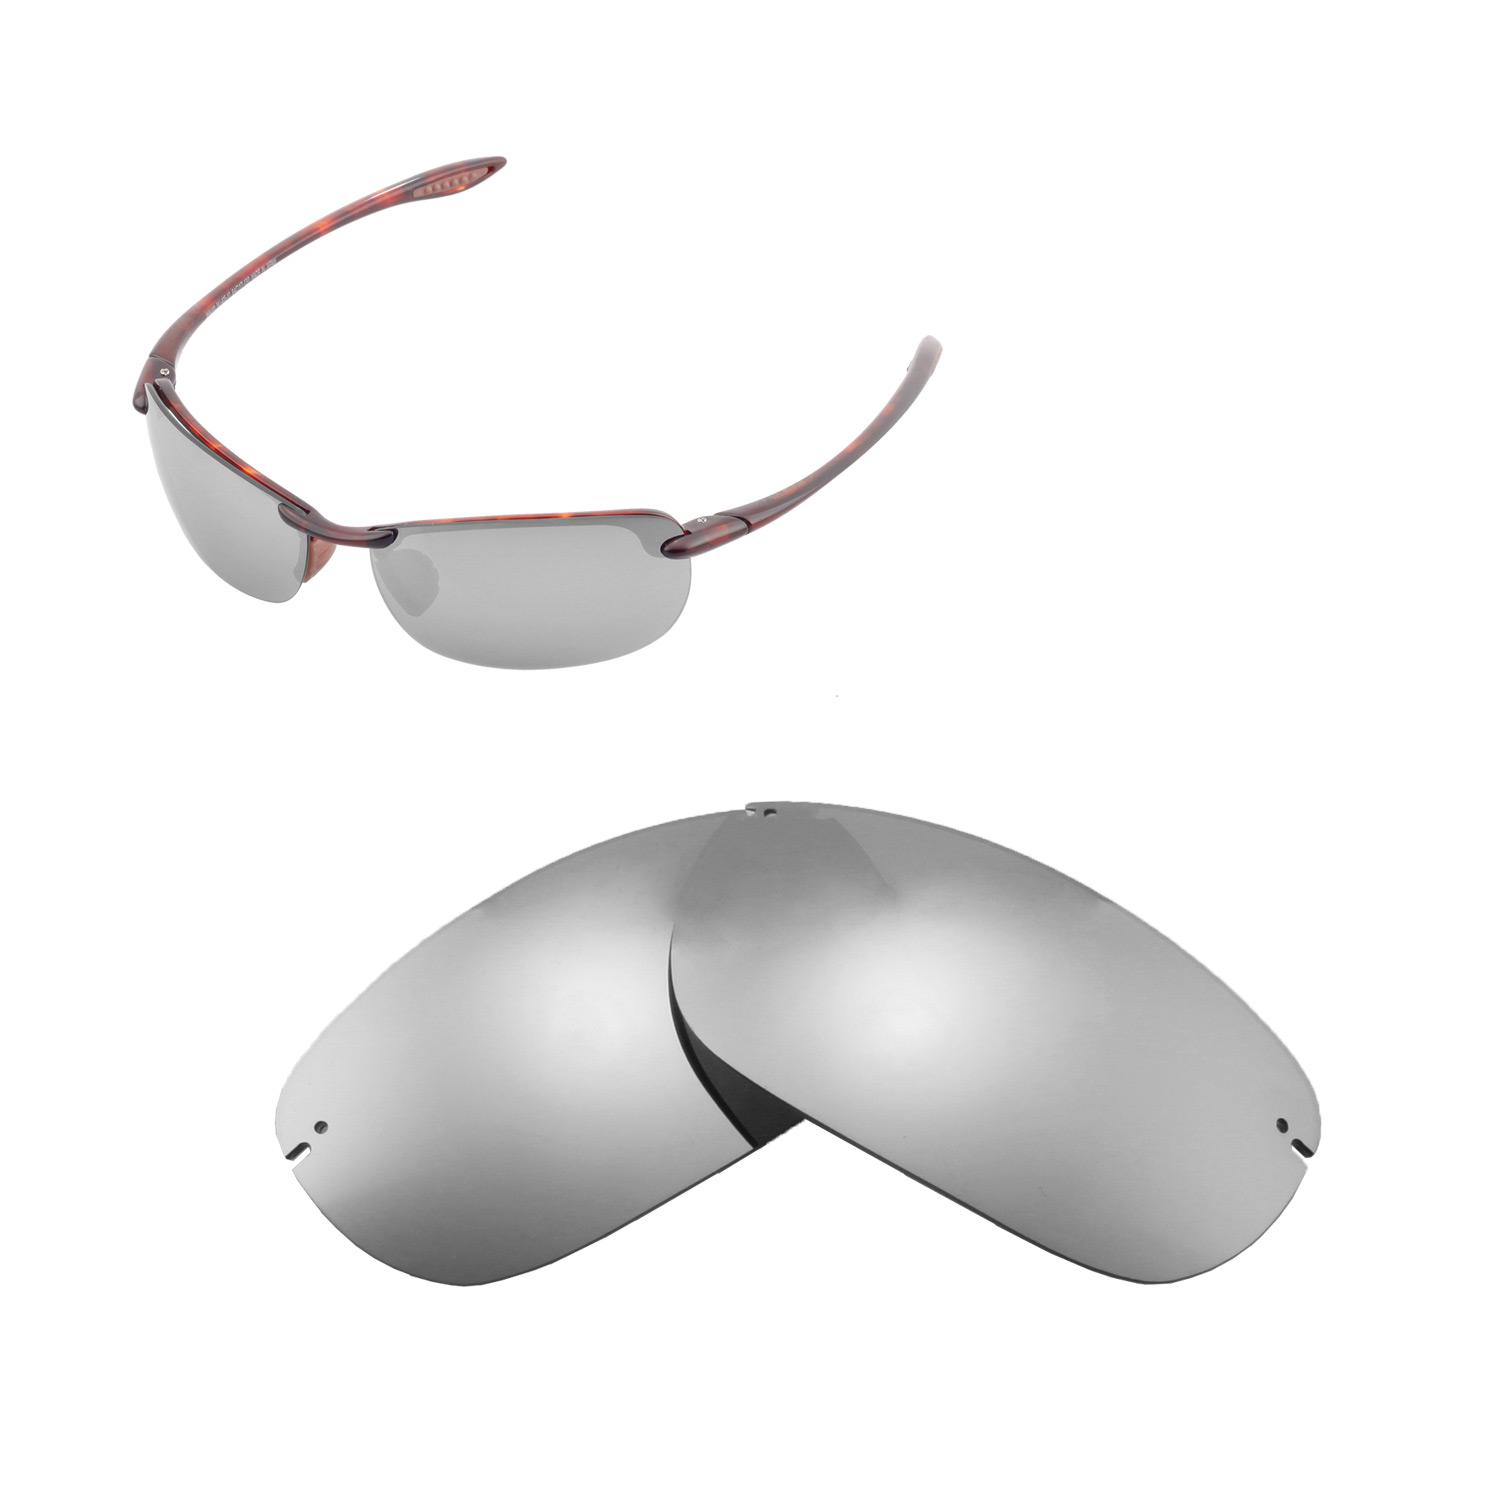 50a9caee4e6c Details about Walleva Polarized Titanium Replacement Lenses For Maui Jim  Makaha Sunglasses